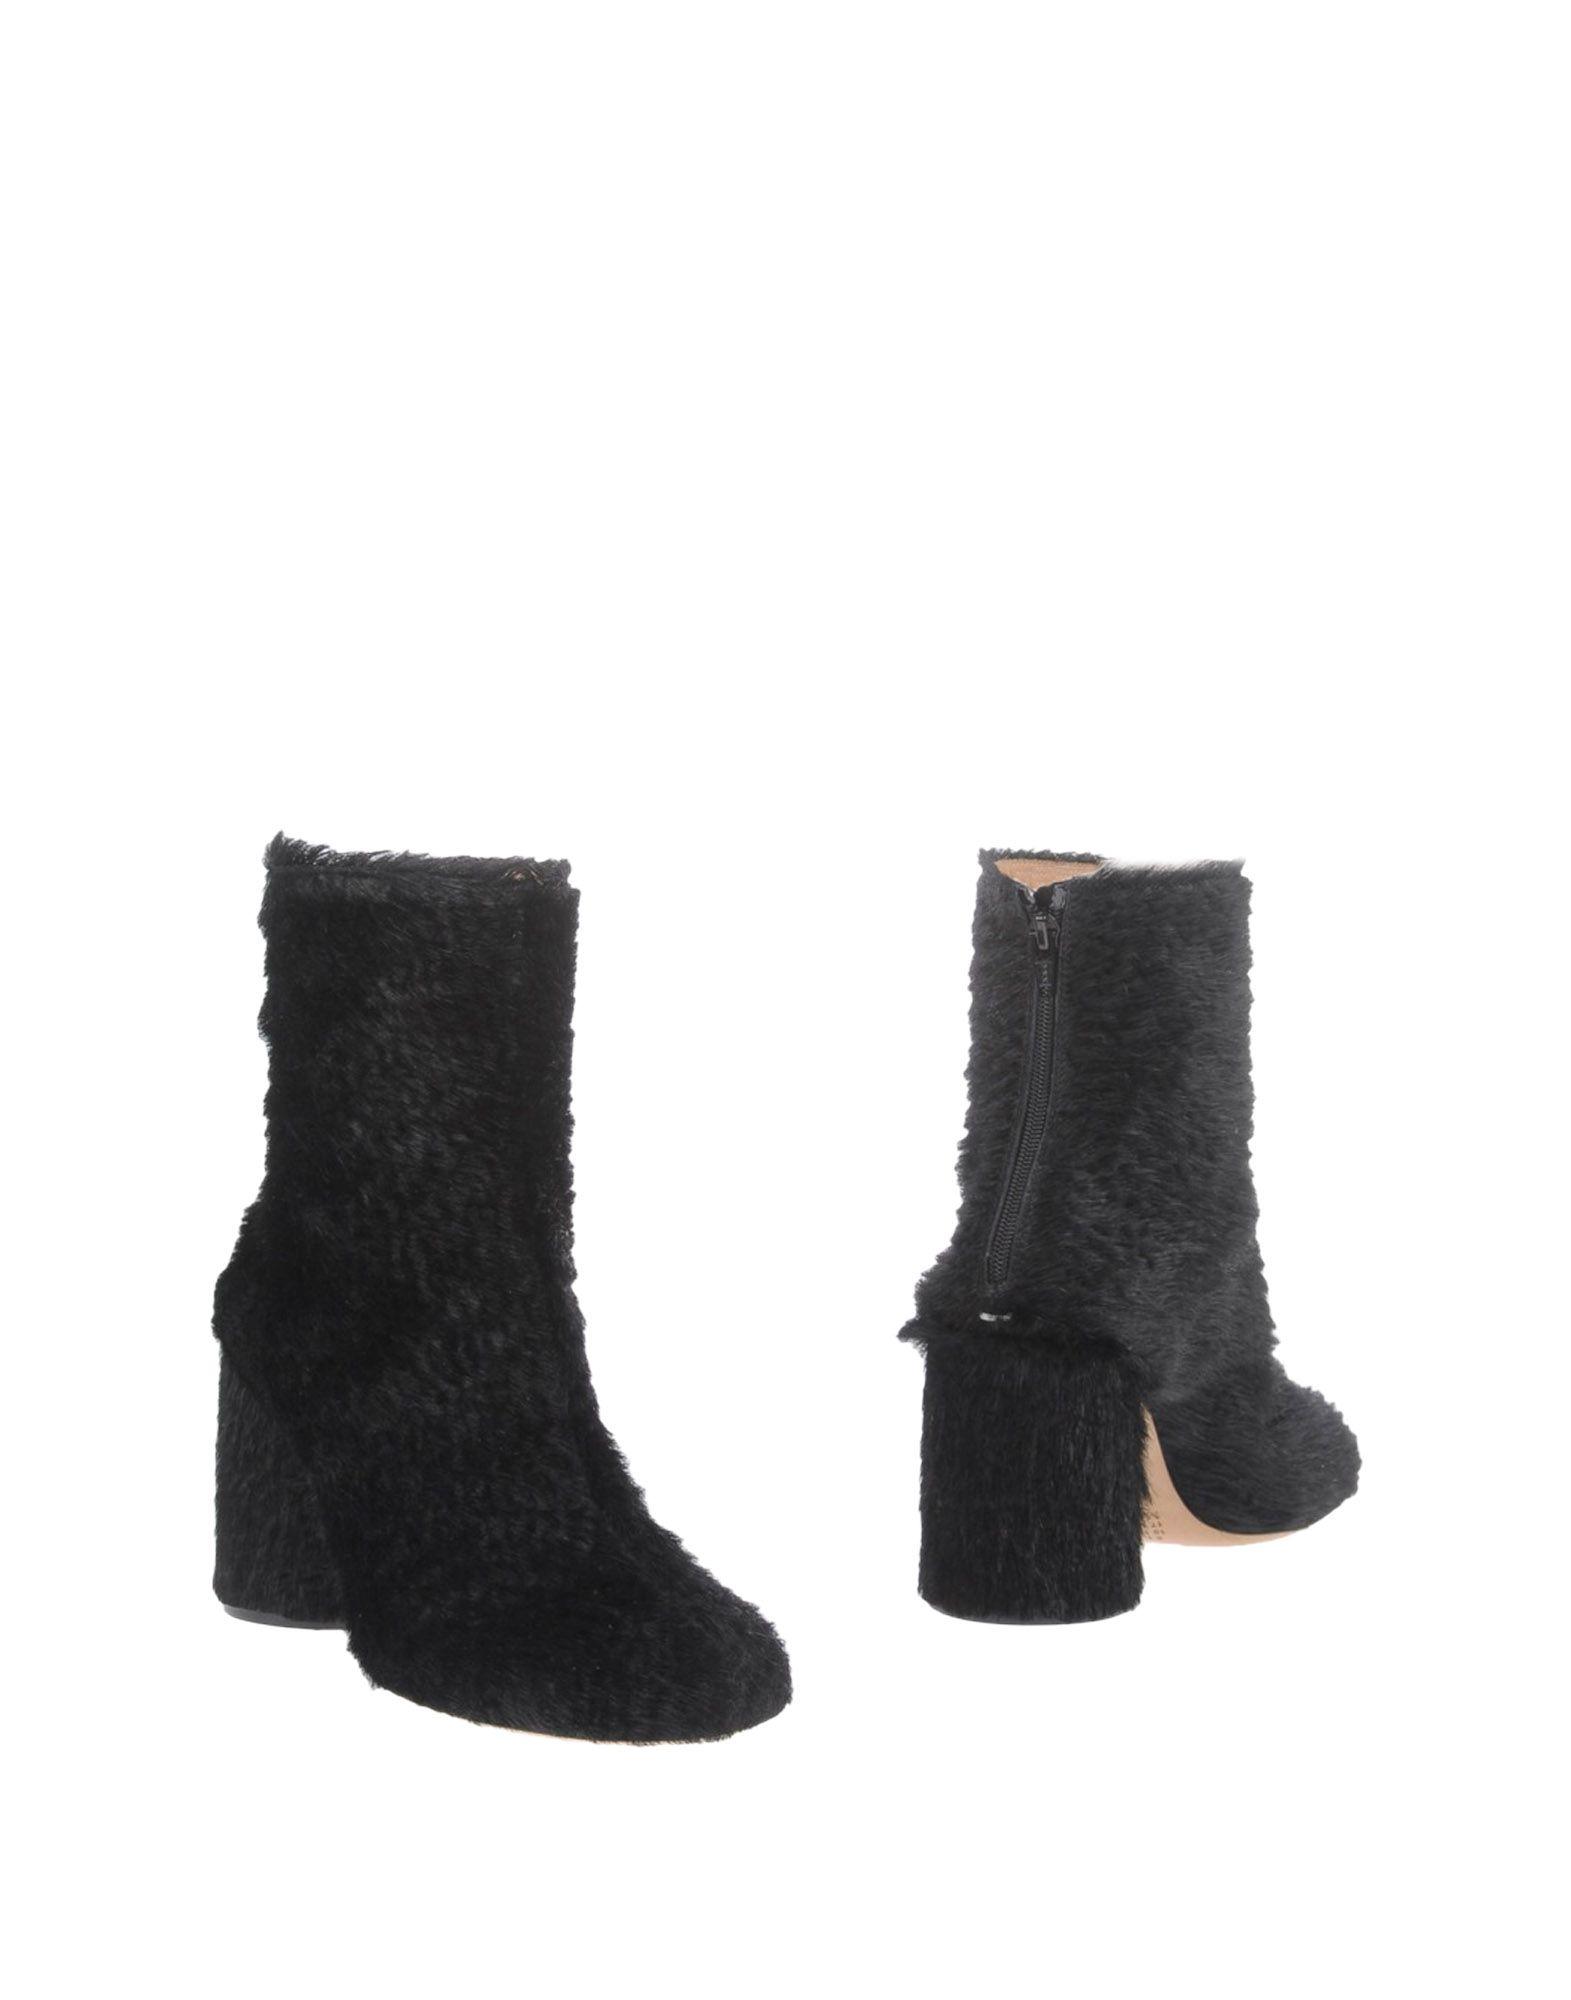 Maison 11213762WNGünstige Margiela Stiefelette Damen  11213762WNGünstige Maison gut aussehende Schuhe e69e04